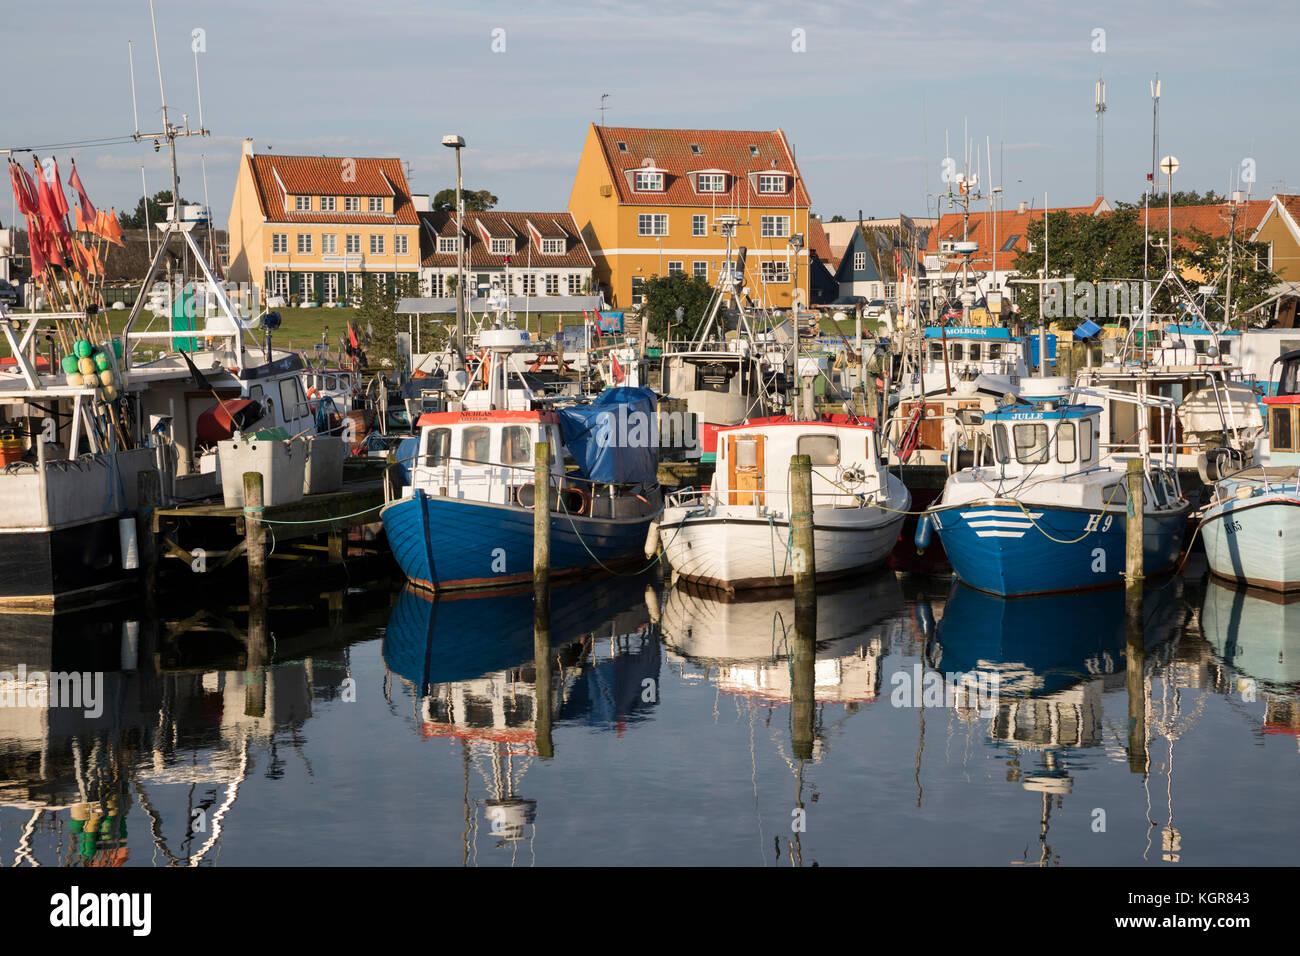 Fishing boats in harbour, Gilleleje, Kattegat Coast, Zealand, Denmark, Europe - Stock Image